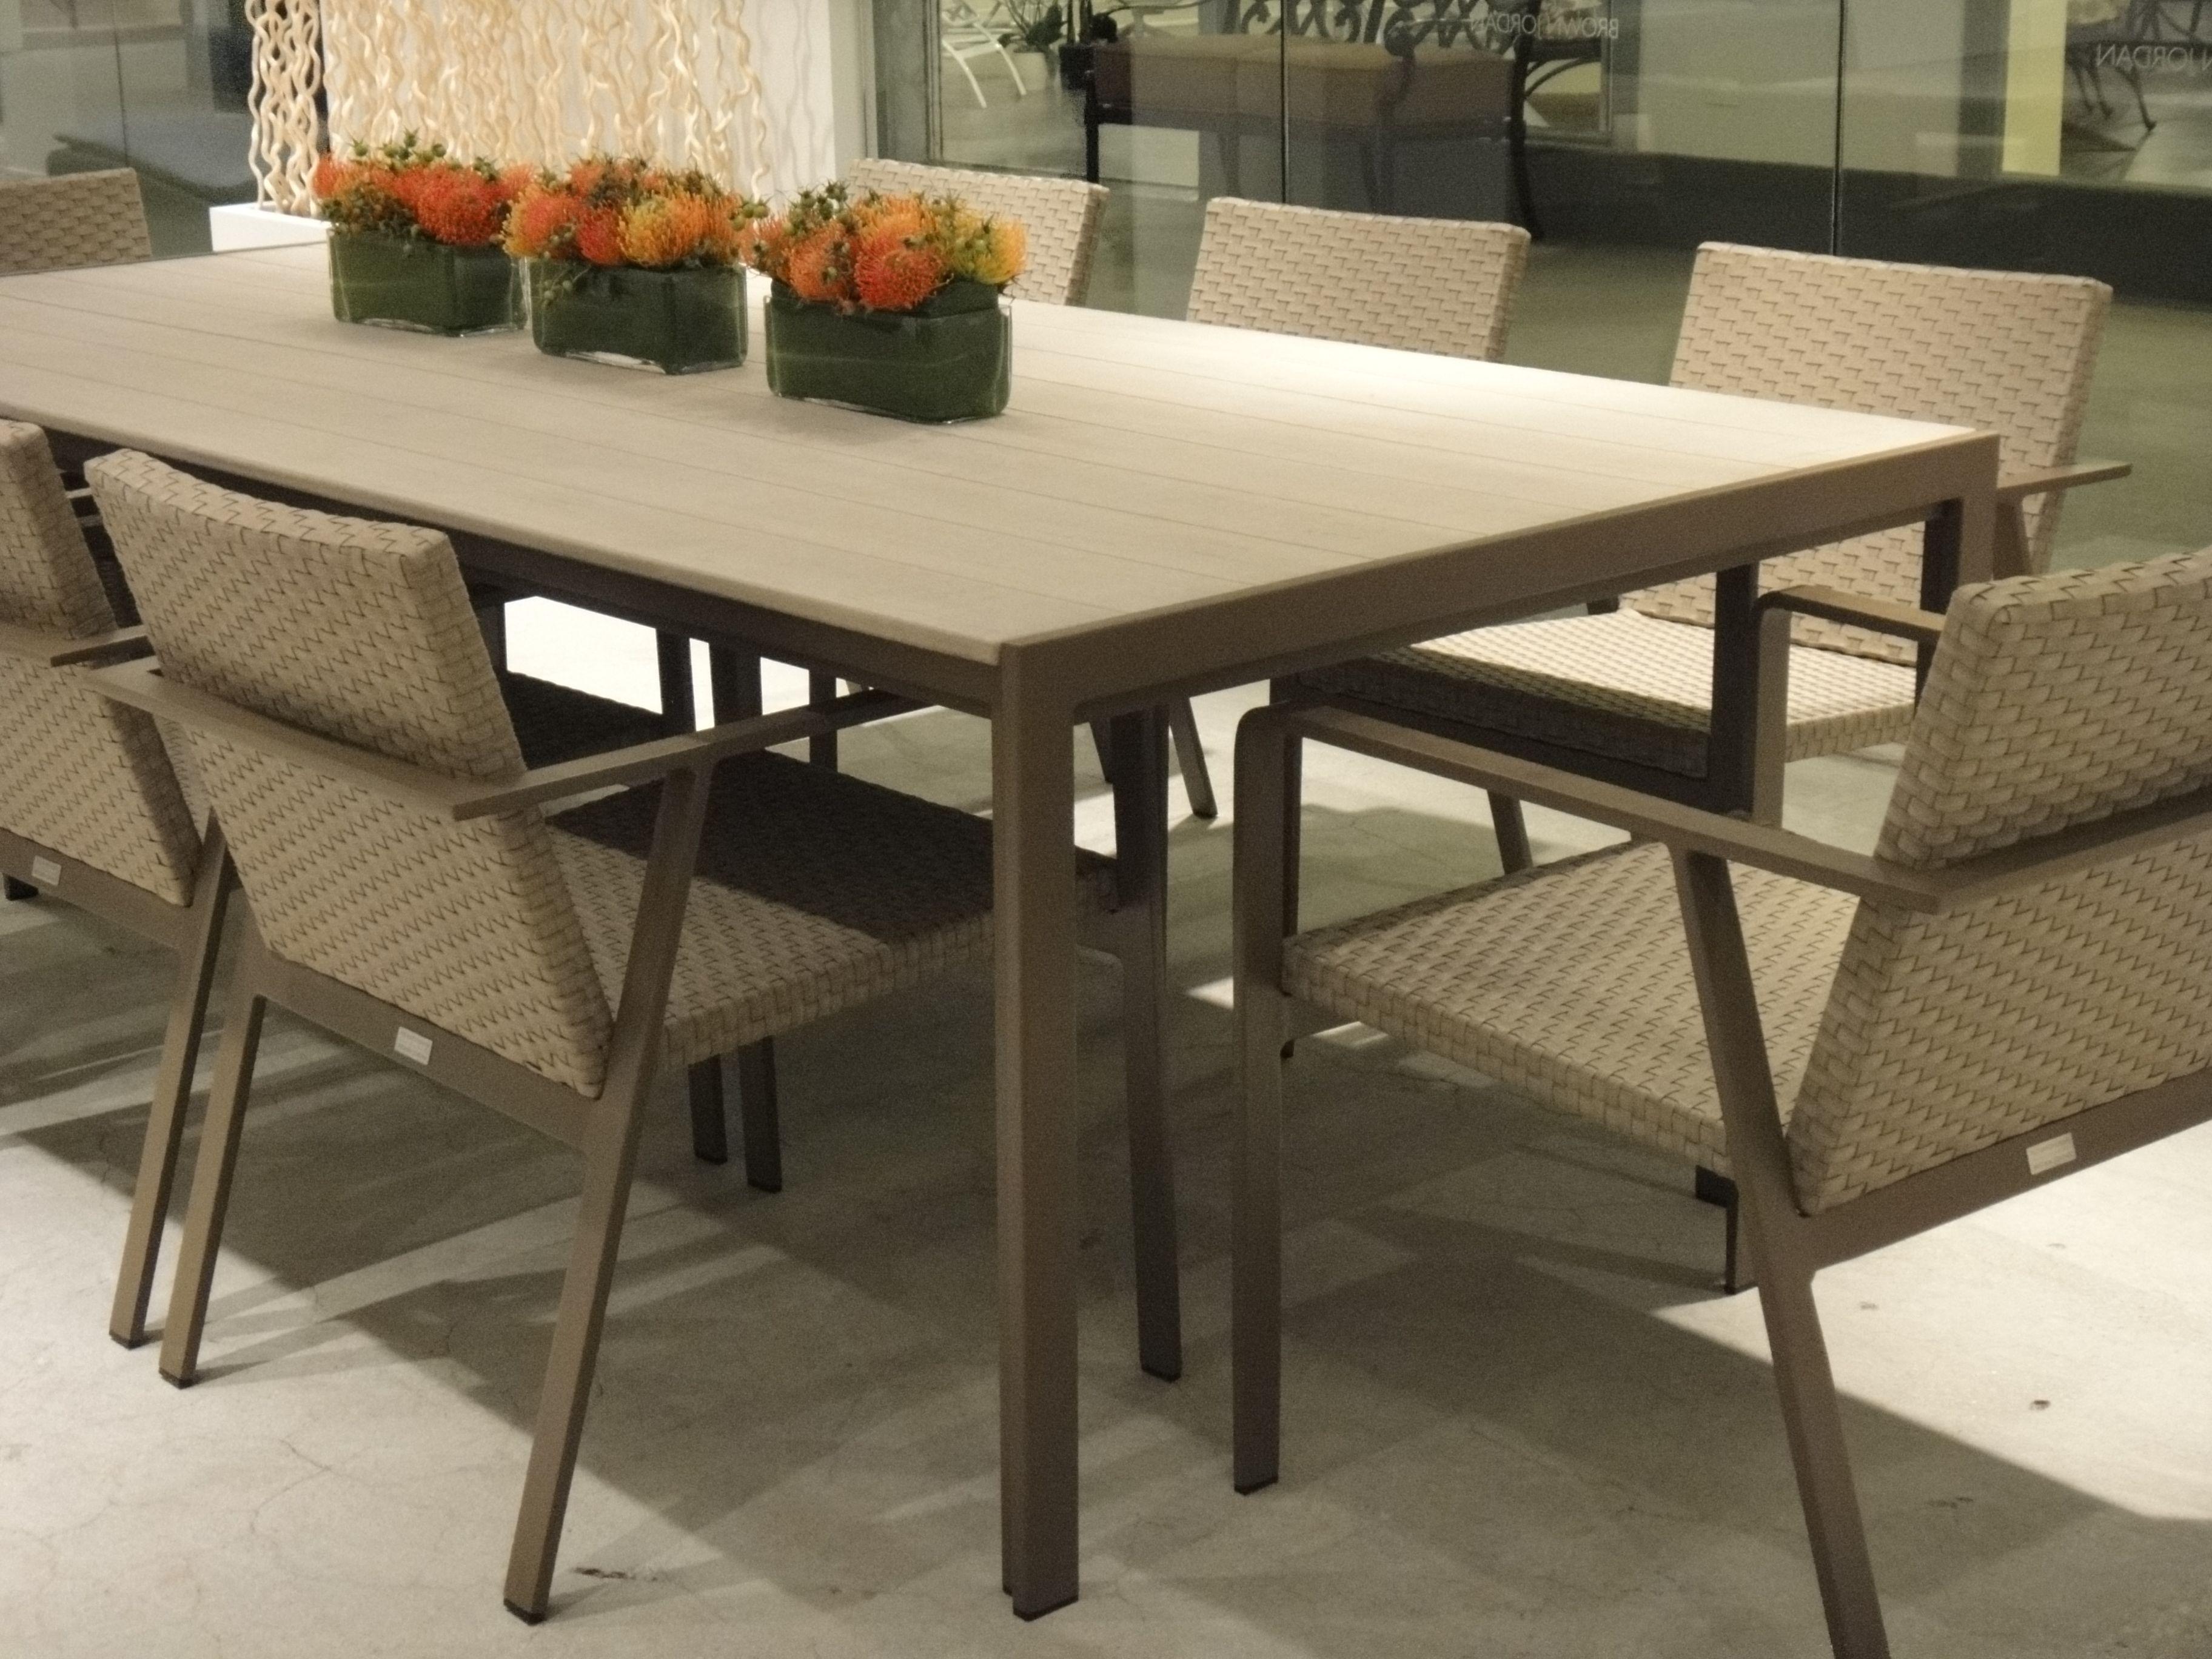 Jordan's Furniture Dining Room Tables